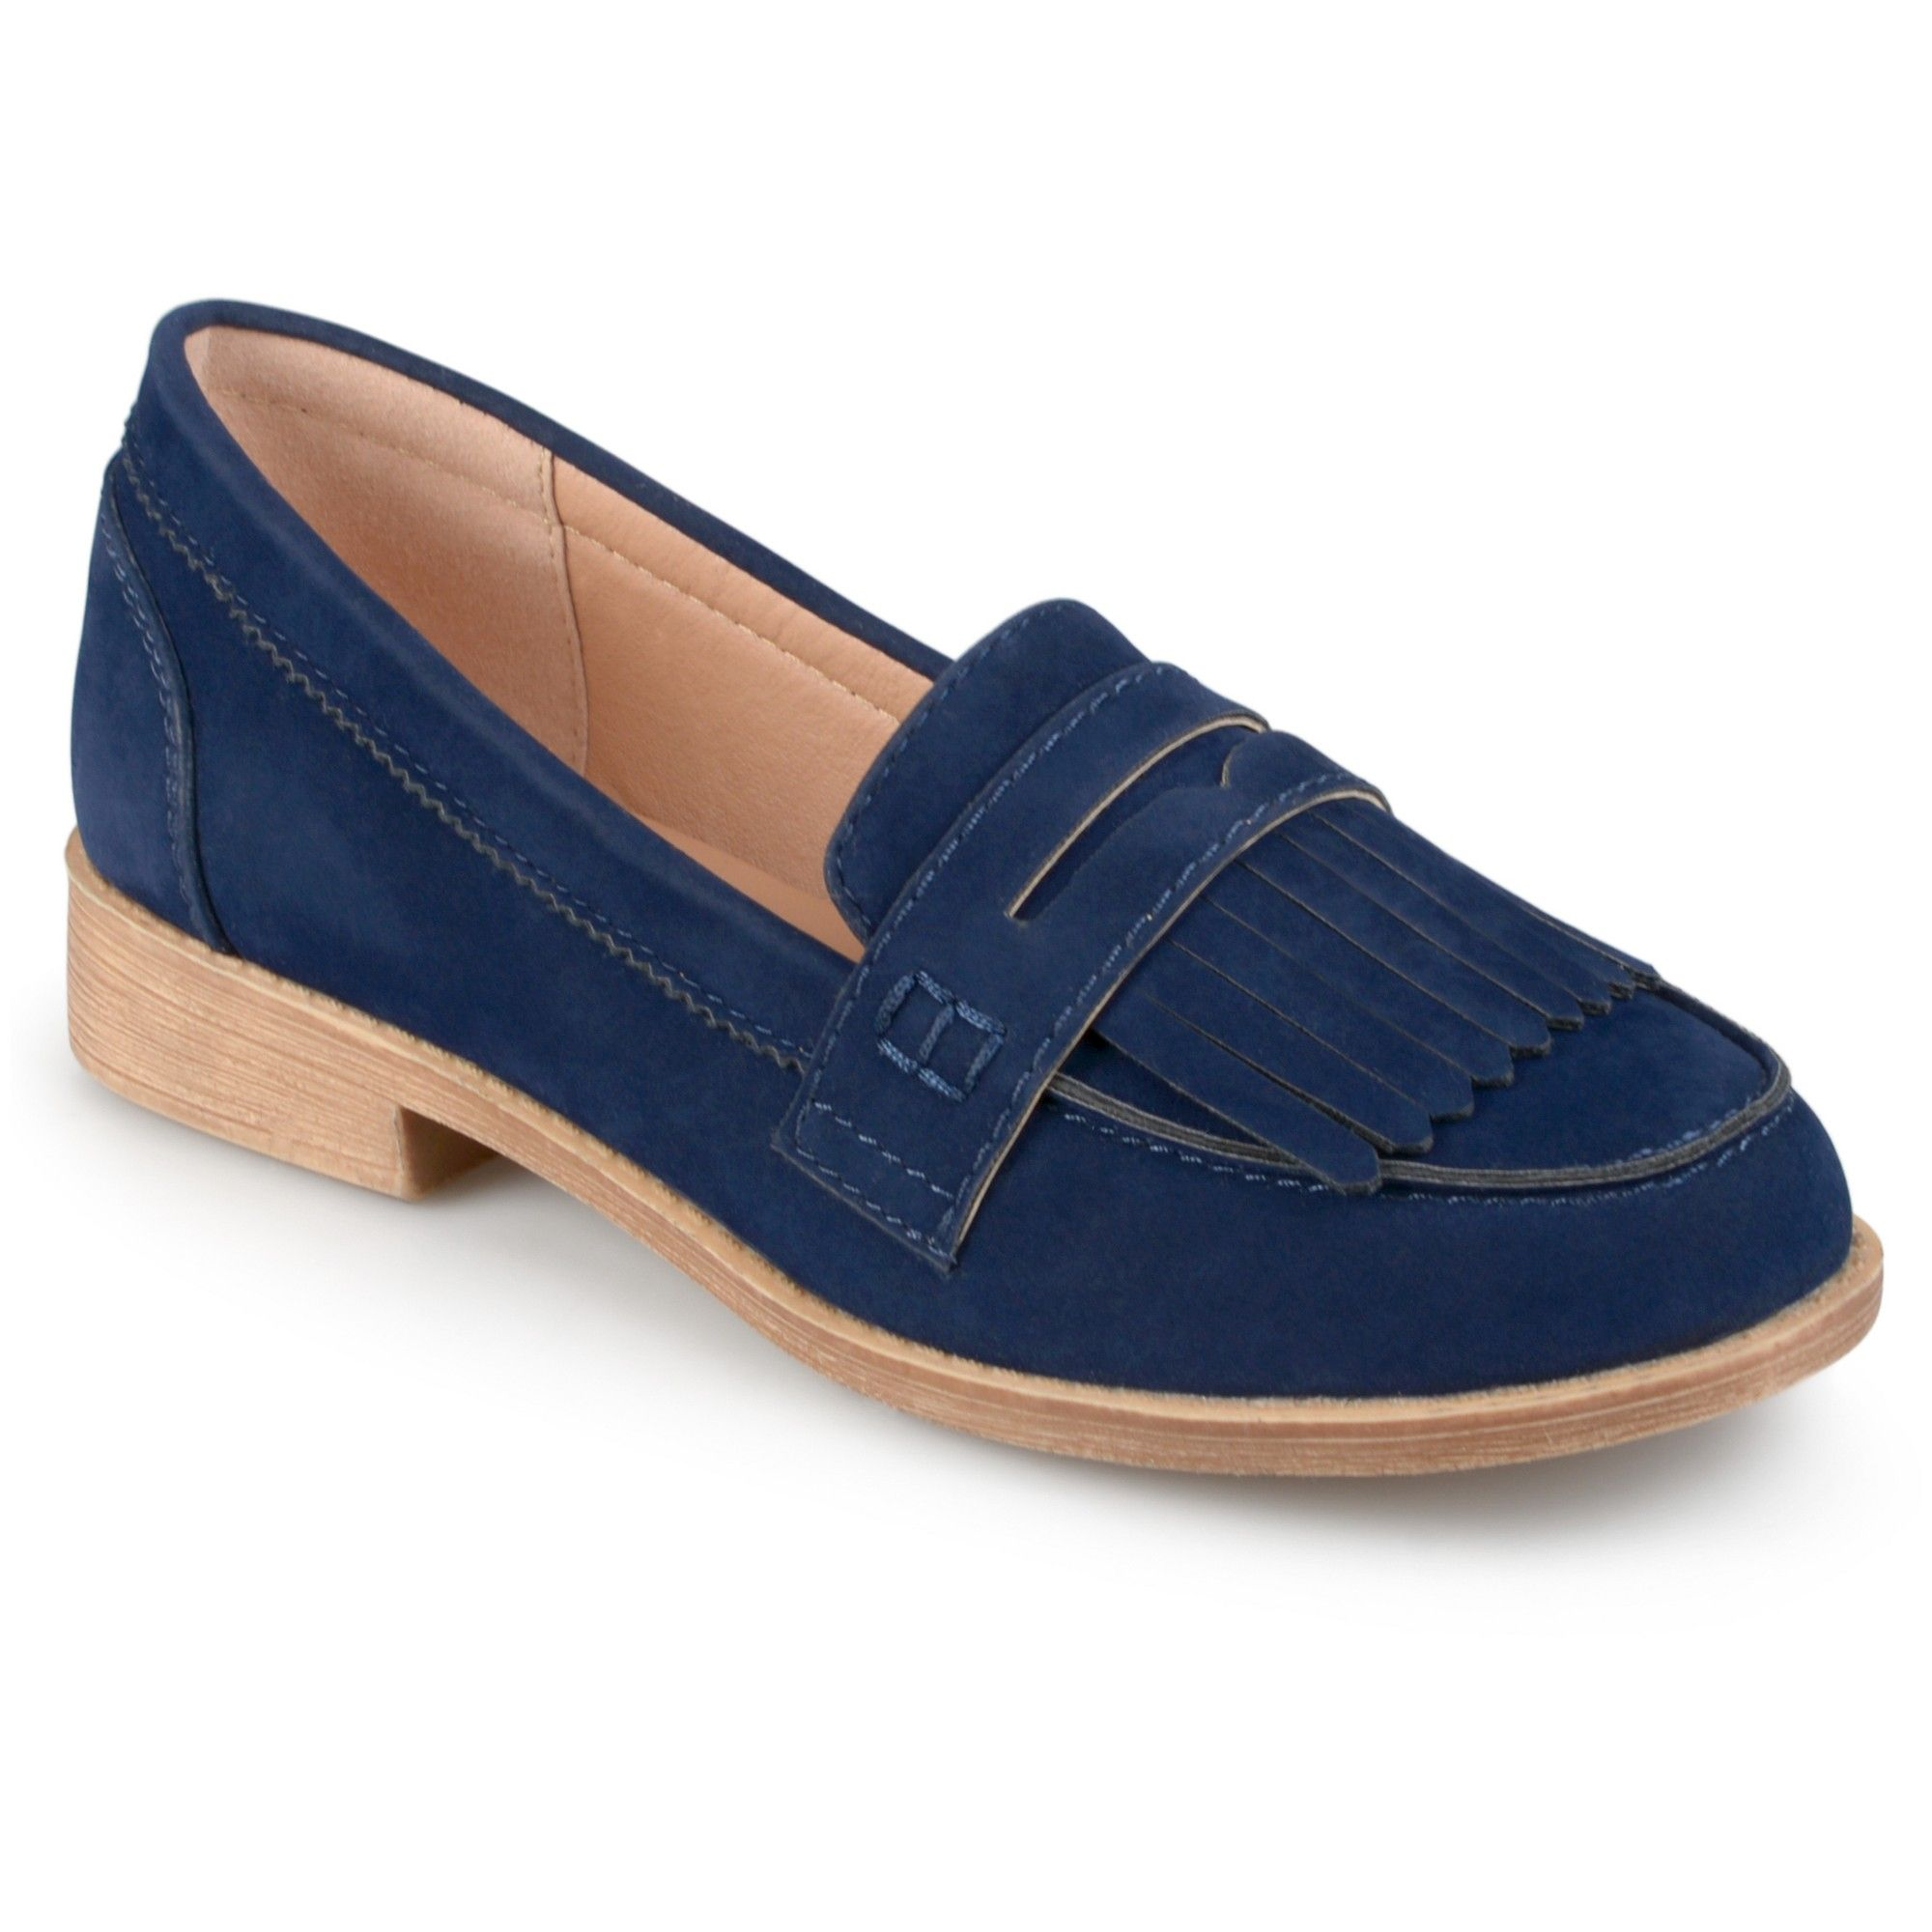 Journee Collection Larue ... Women's Heeled Loafers get authentic cheap online cheap choice sale best discount shop offer cheap sale sneakernews K2iu7GplE